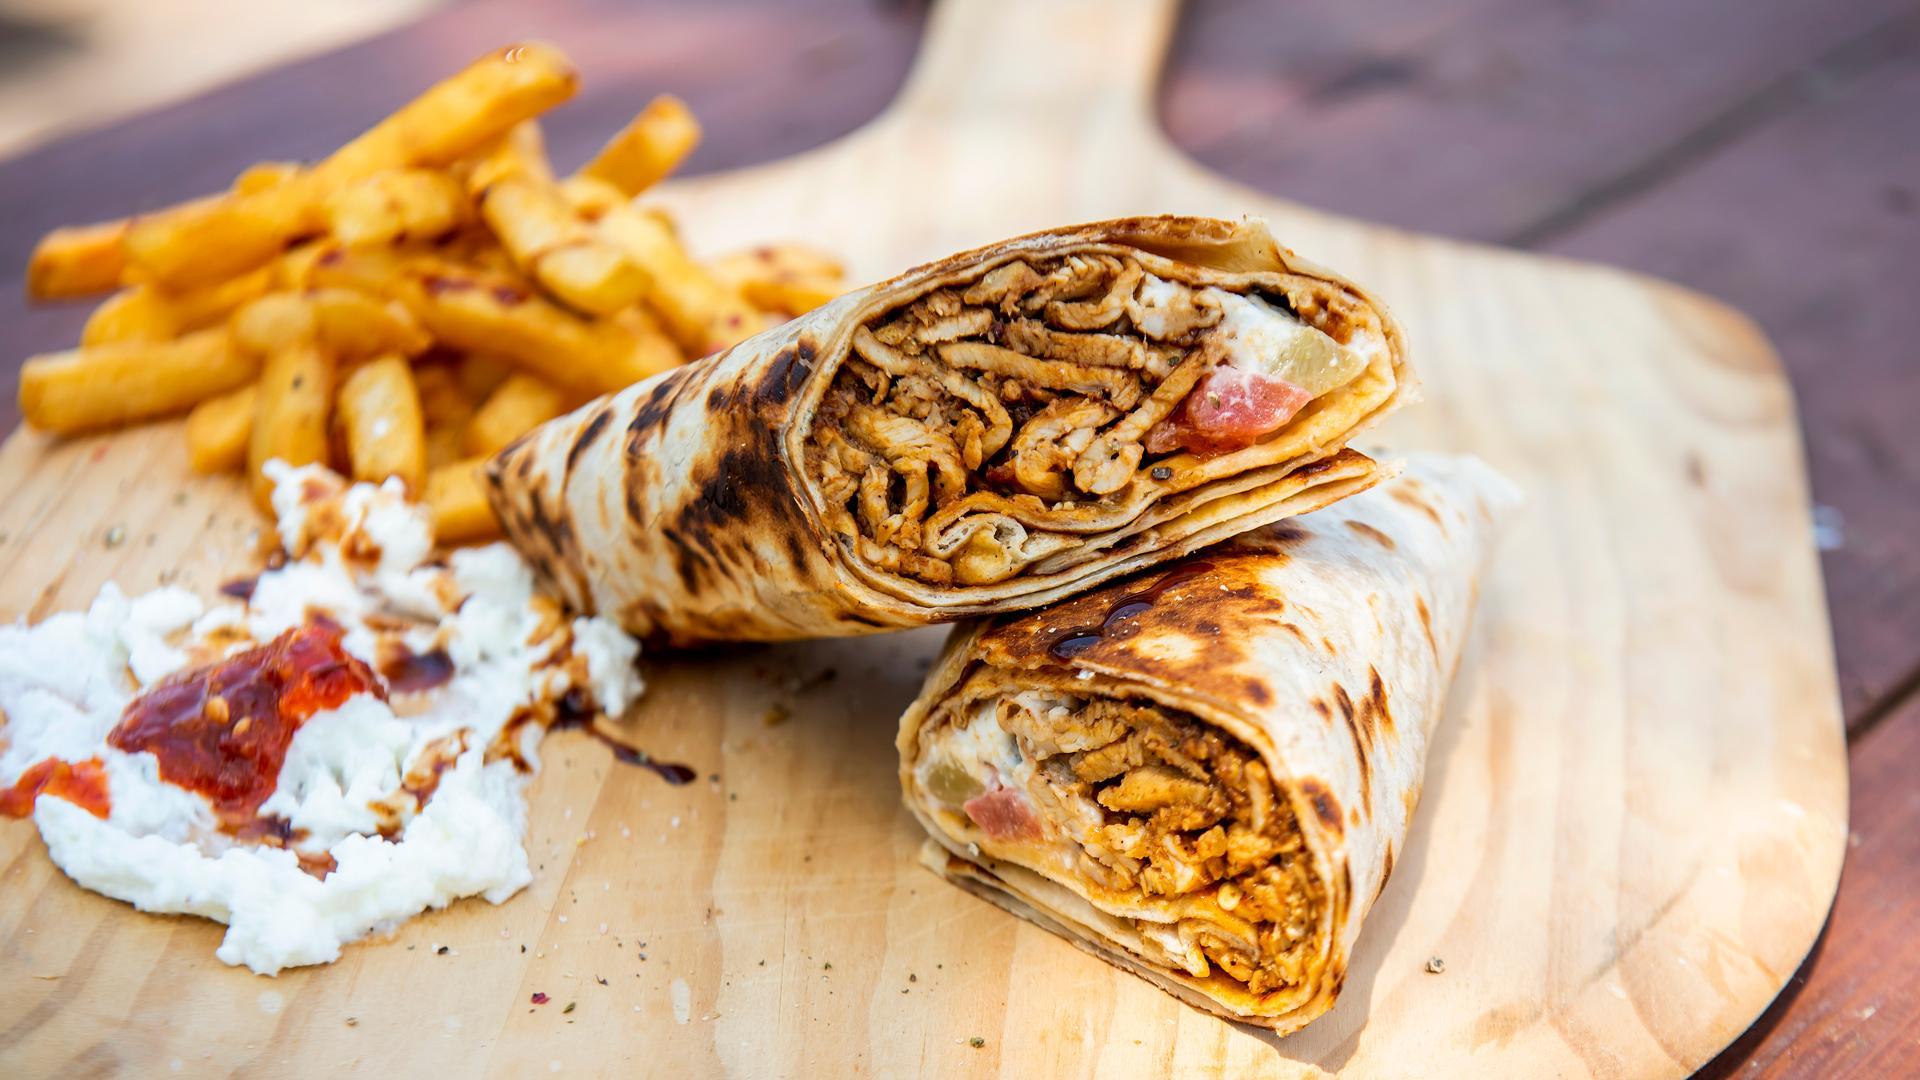 The best Toronto food markets   Chicken shawarma from Chef Harwash at Market 707